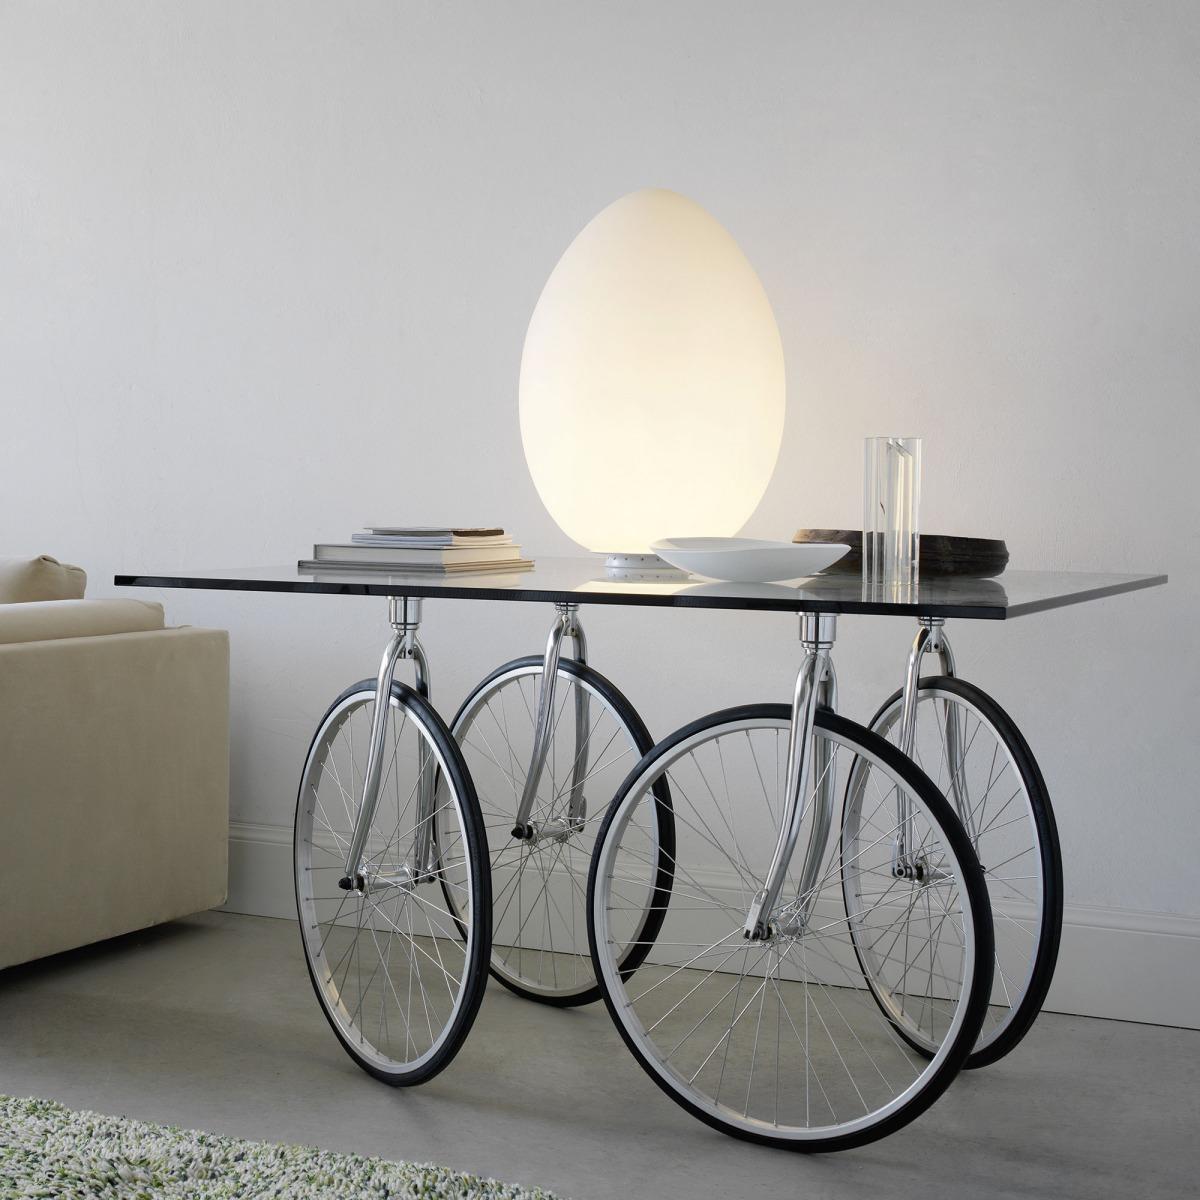 Fontana Arte Tour Table with Uovo Table Lamp